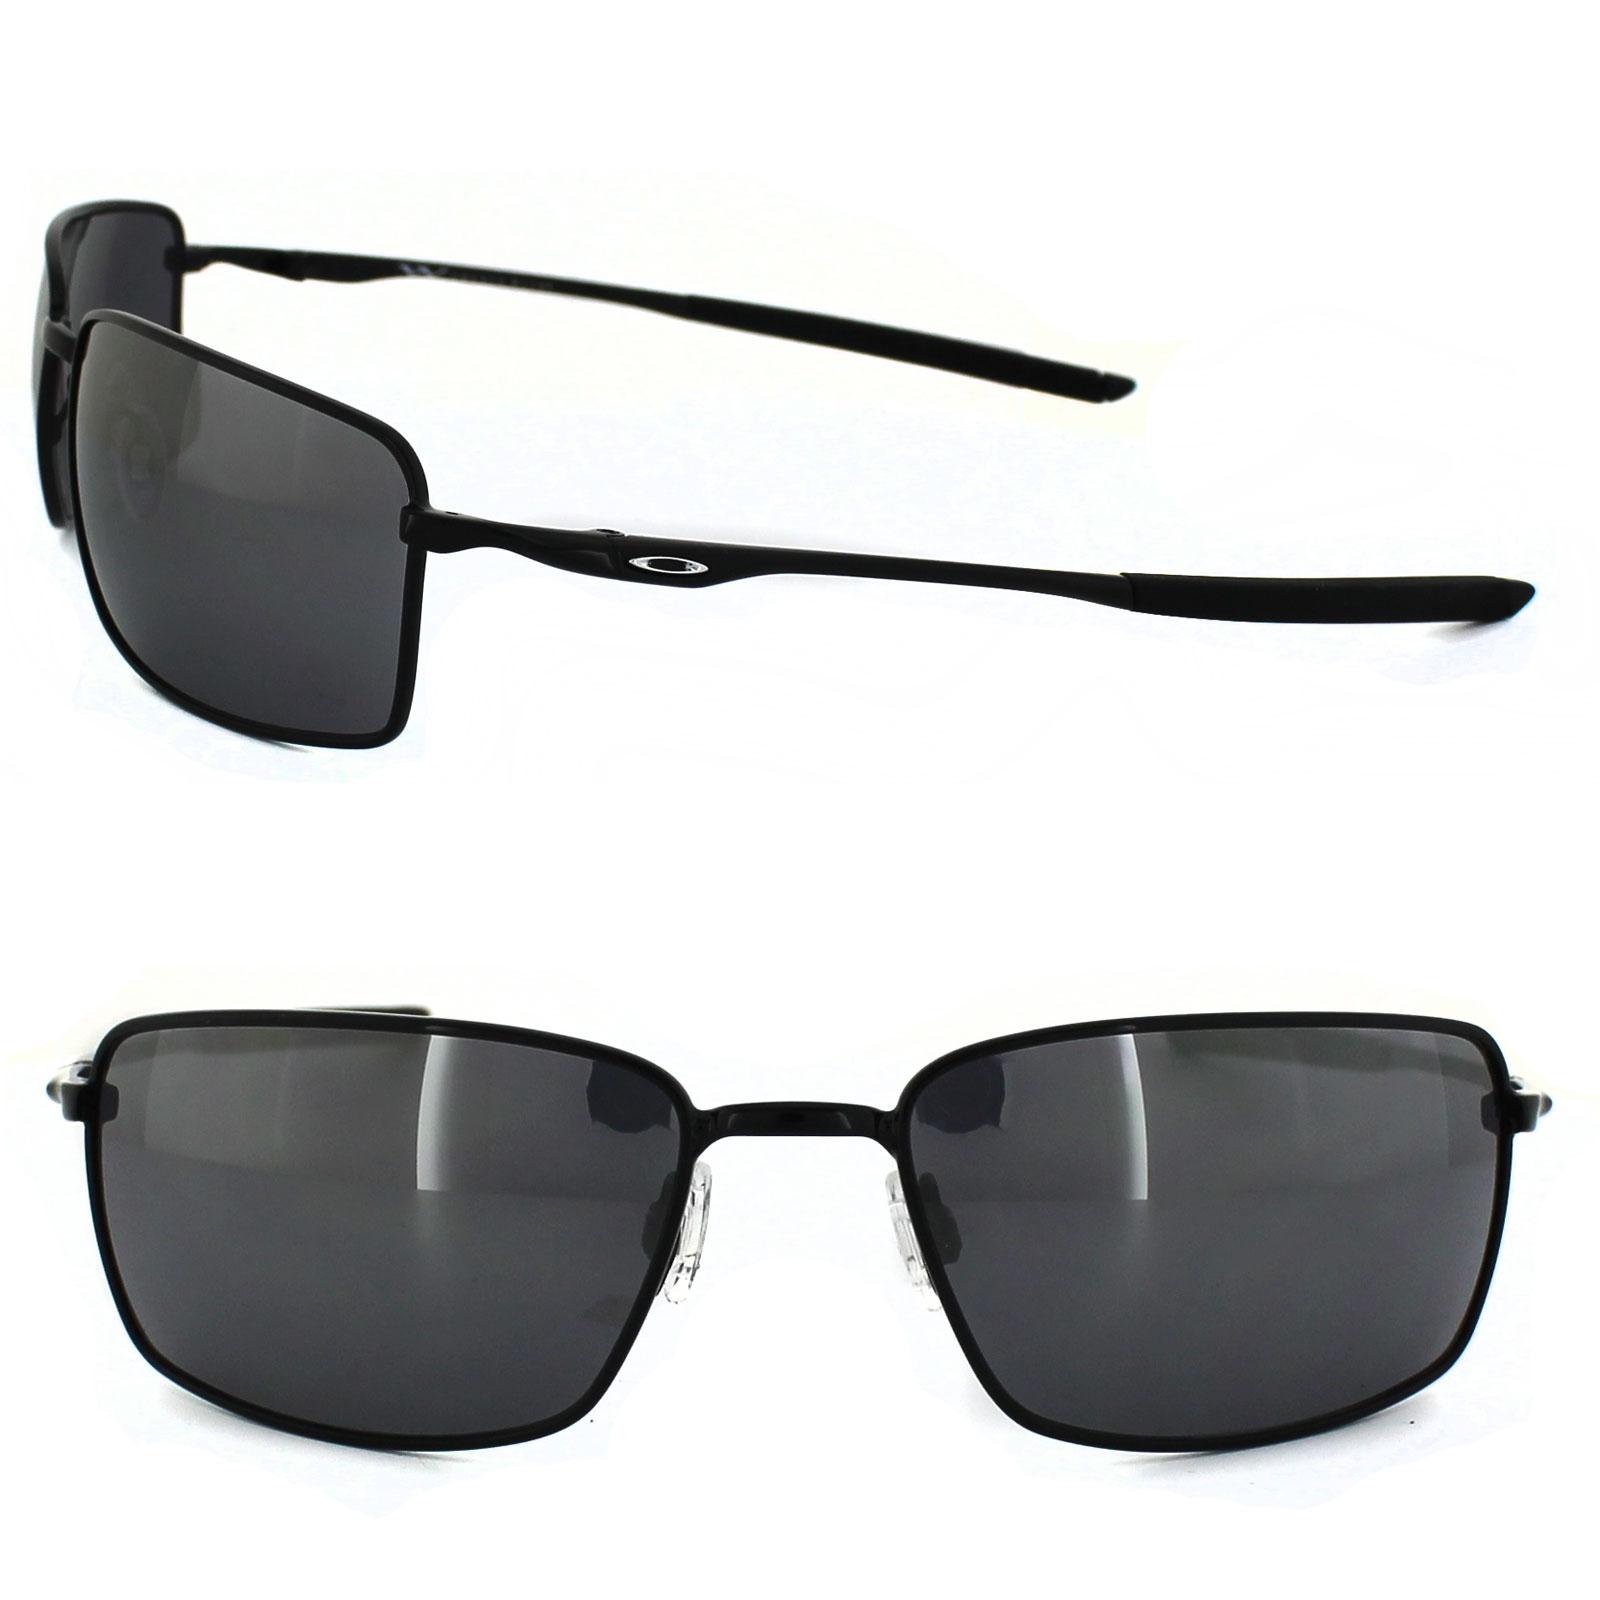 578744ec04 Sentinel Oakley Sunglasses Square Wire OO4075-01 Polished Black Black  Iridium